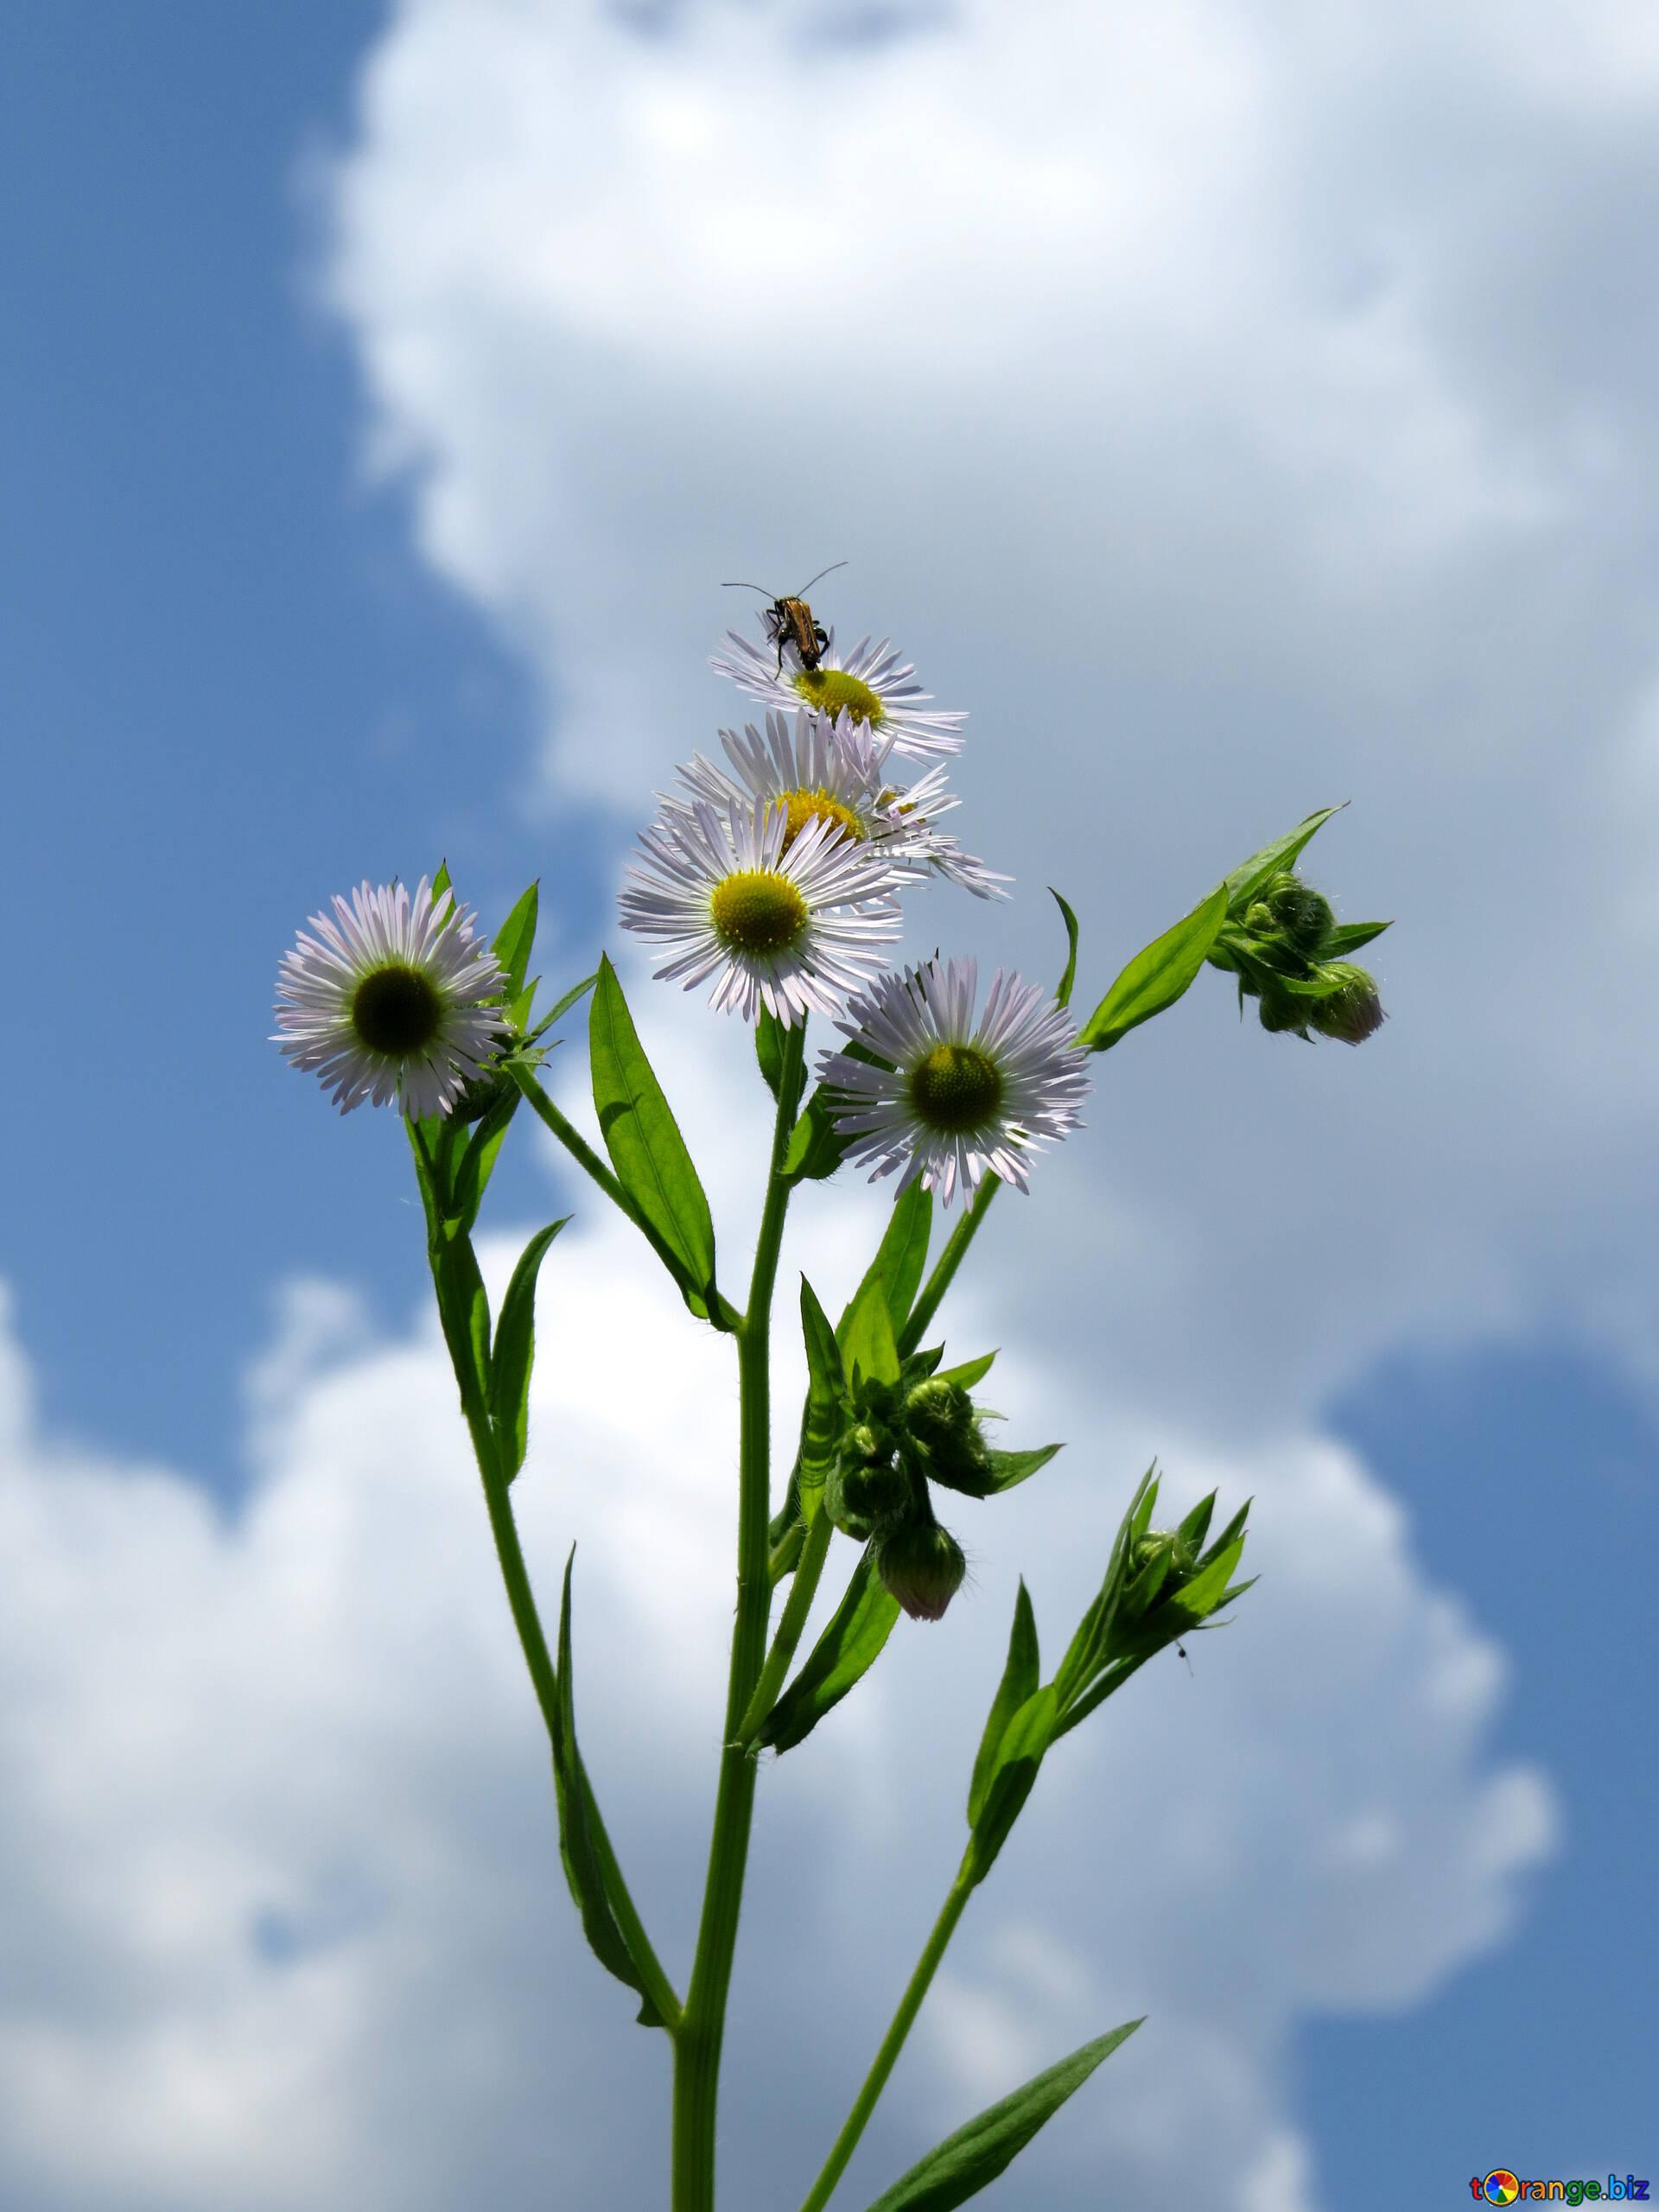 Wild aster daisy flower on sky background summer 25024 download free image flower on sky background in hd wallpaper size 1920px izmirmasajfo